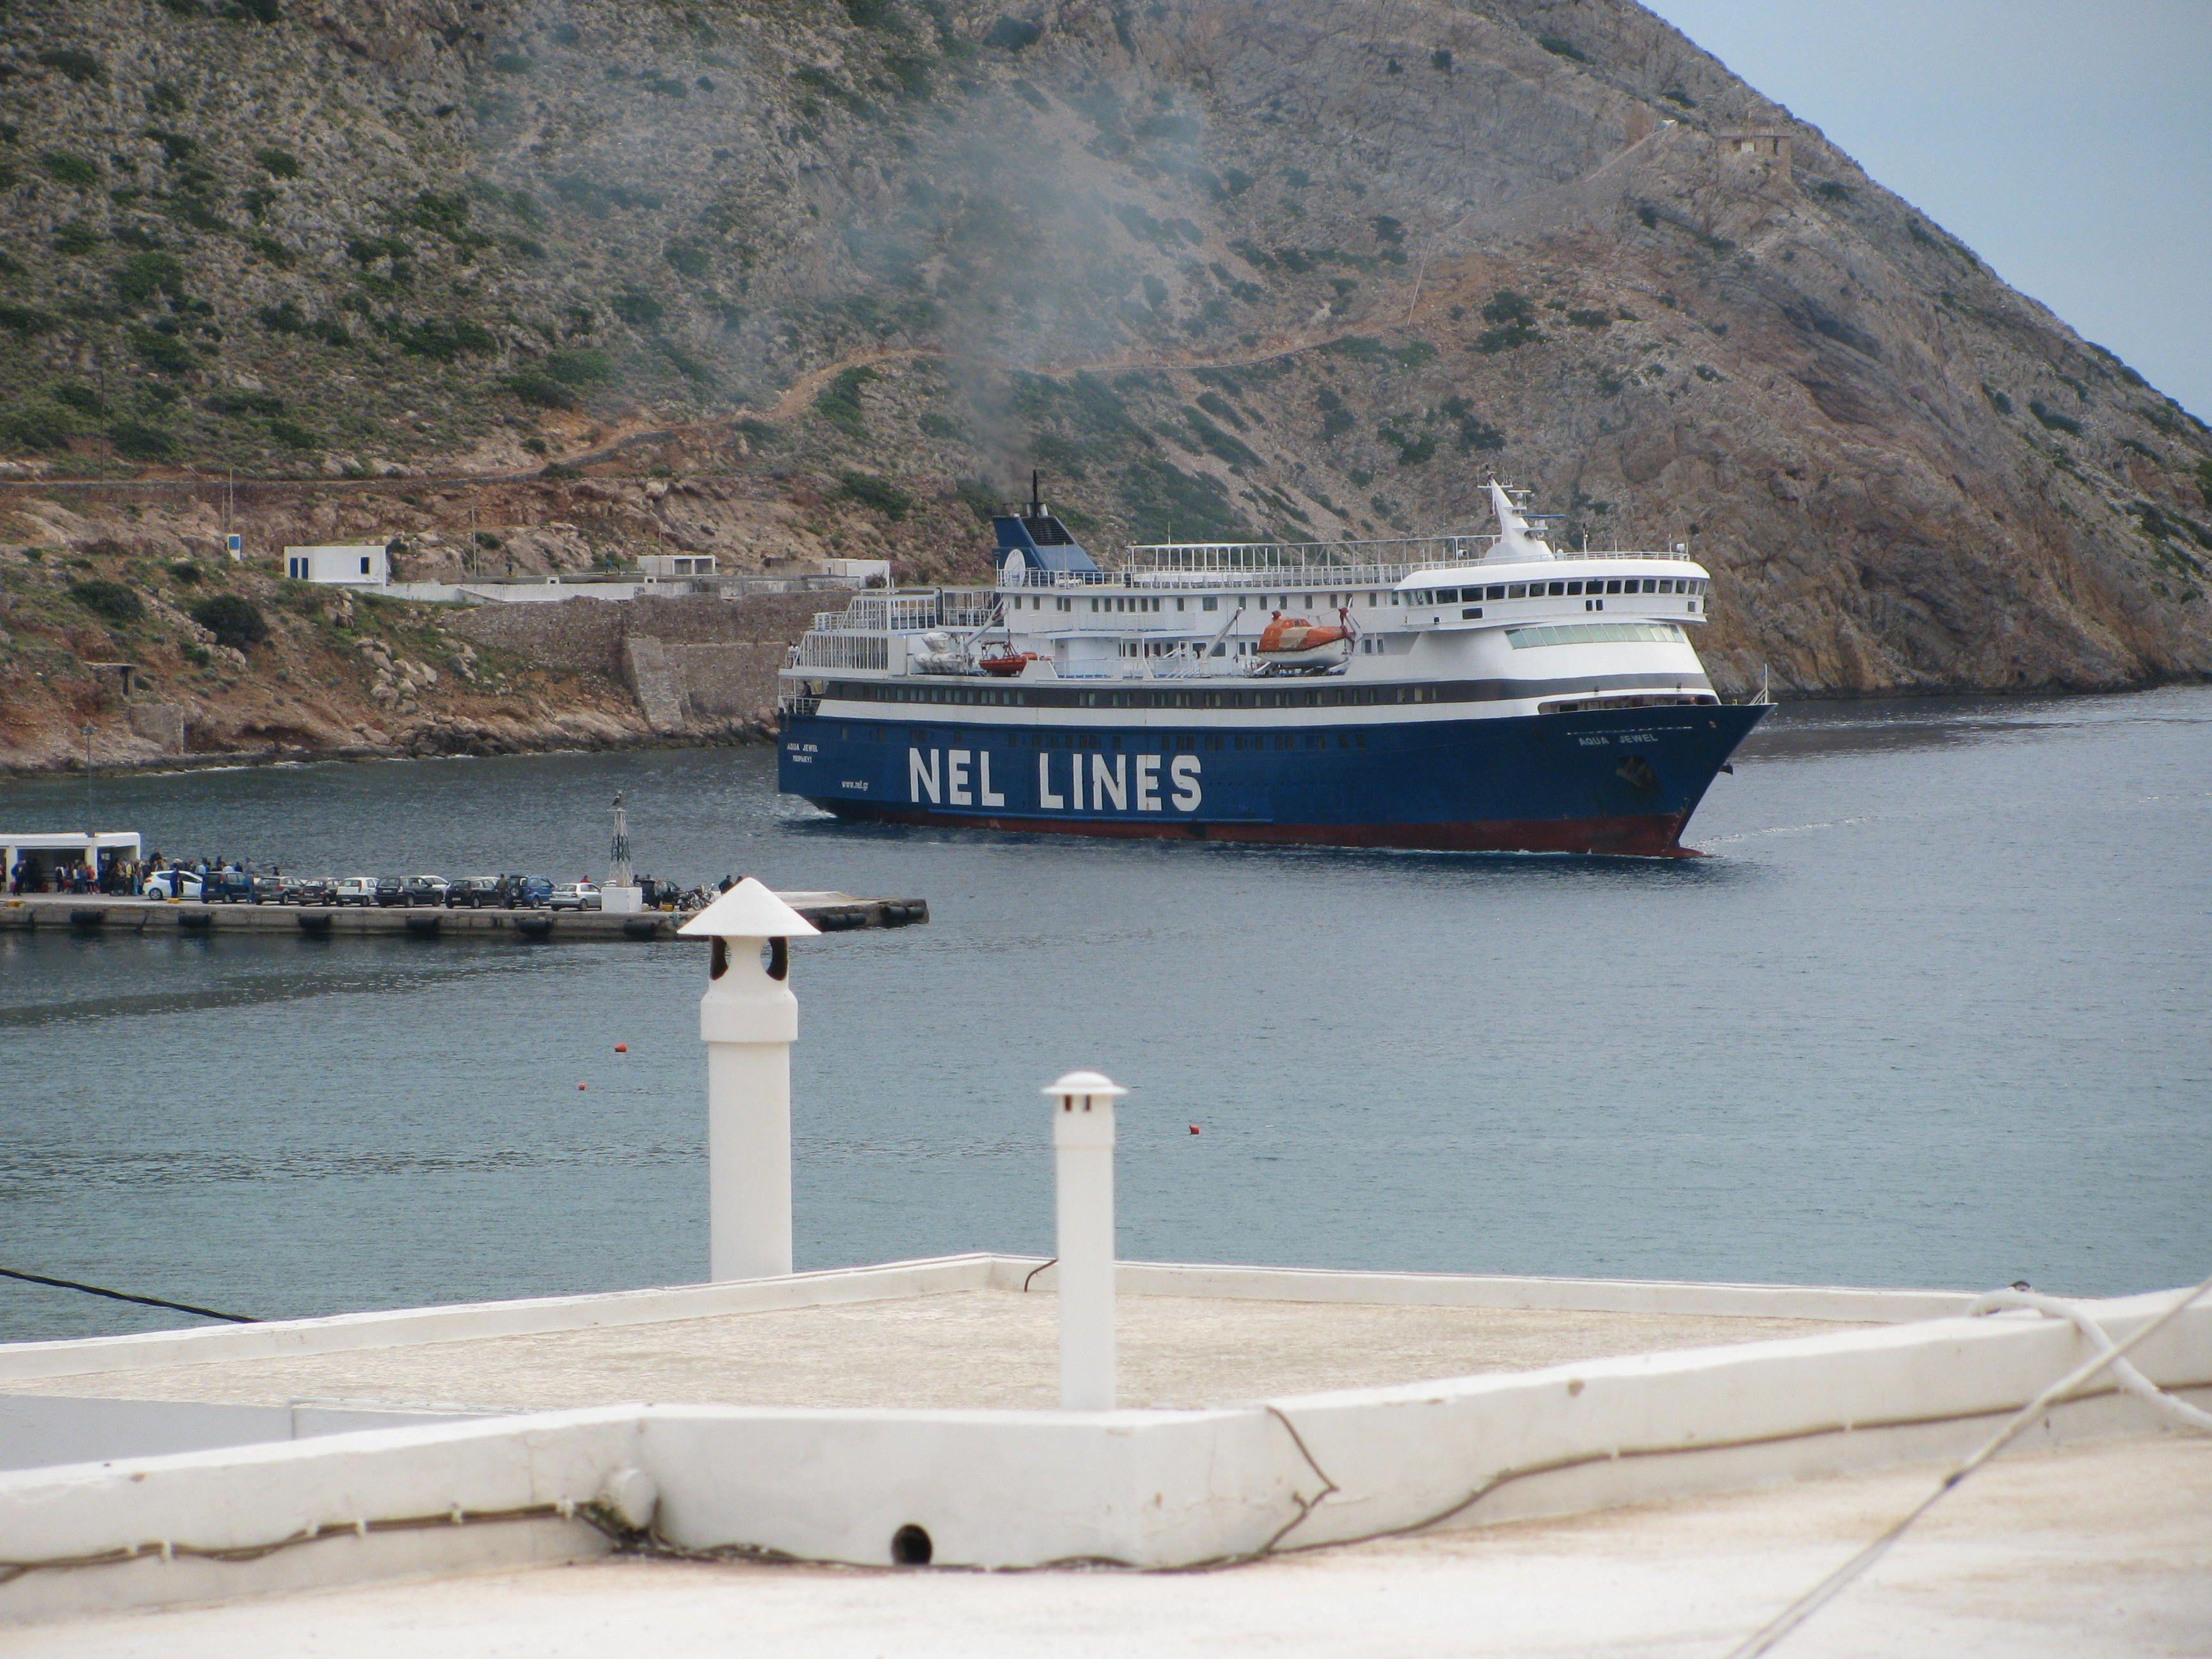 Book color line ferry - Book Color Line Ferry 48